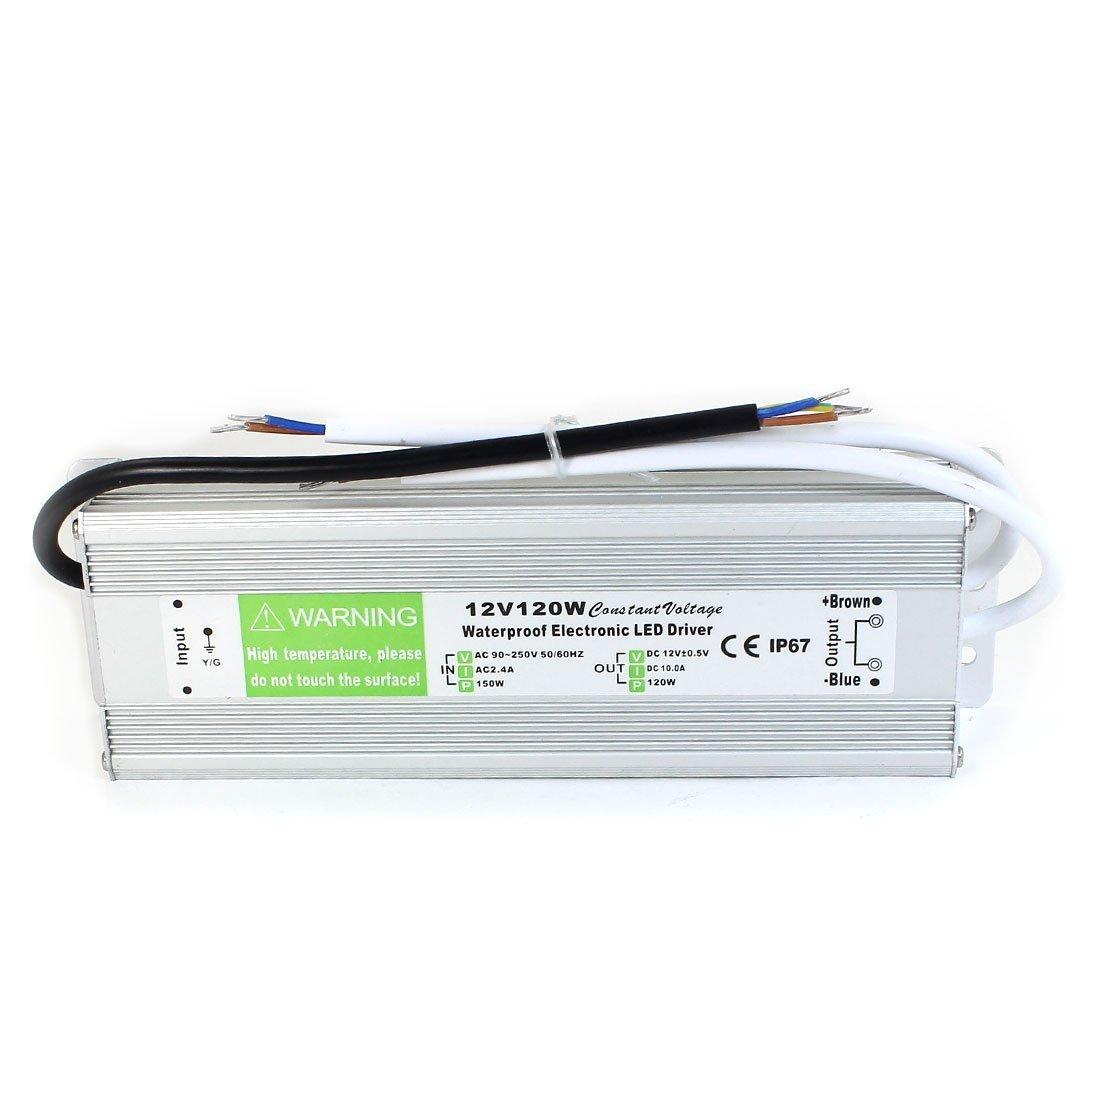 JOYLIT 120W IP67 Waterproof Aluminum Alloy LED Power Supply Driver LED Transformer 110-240V to 12V DC Output